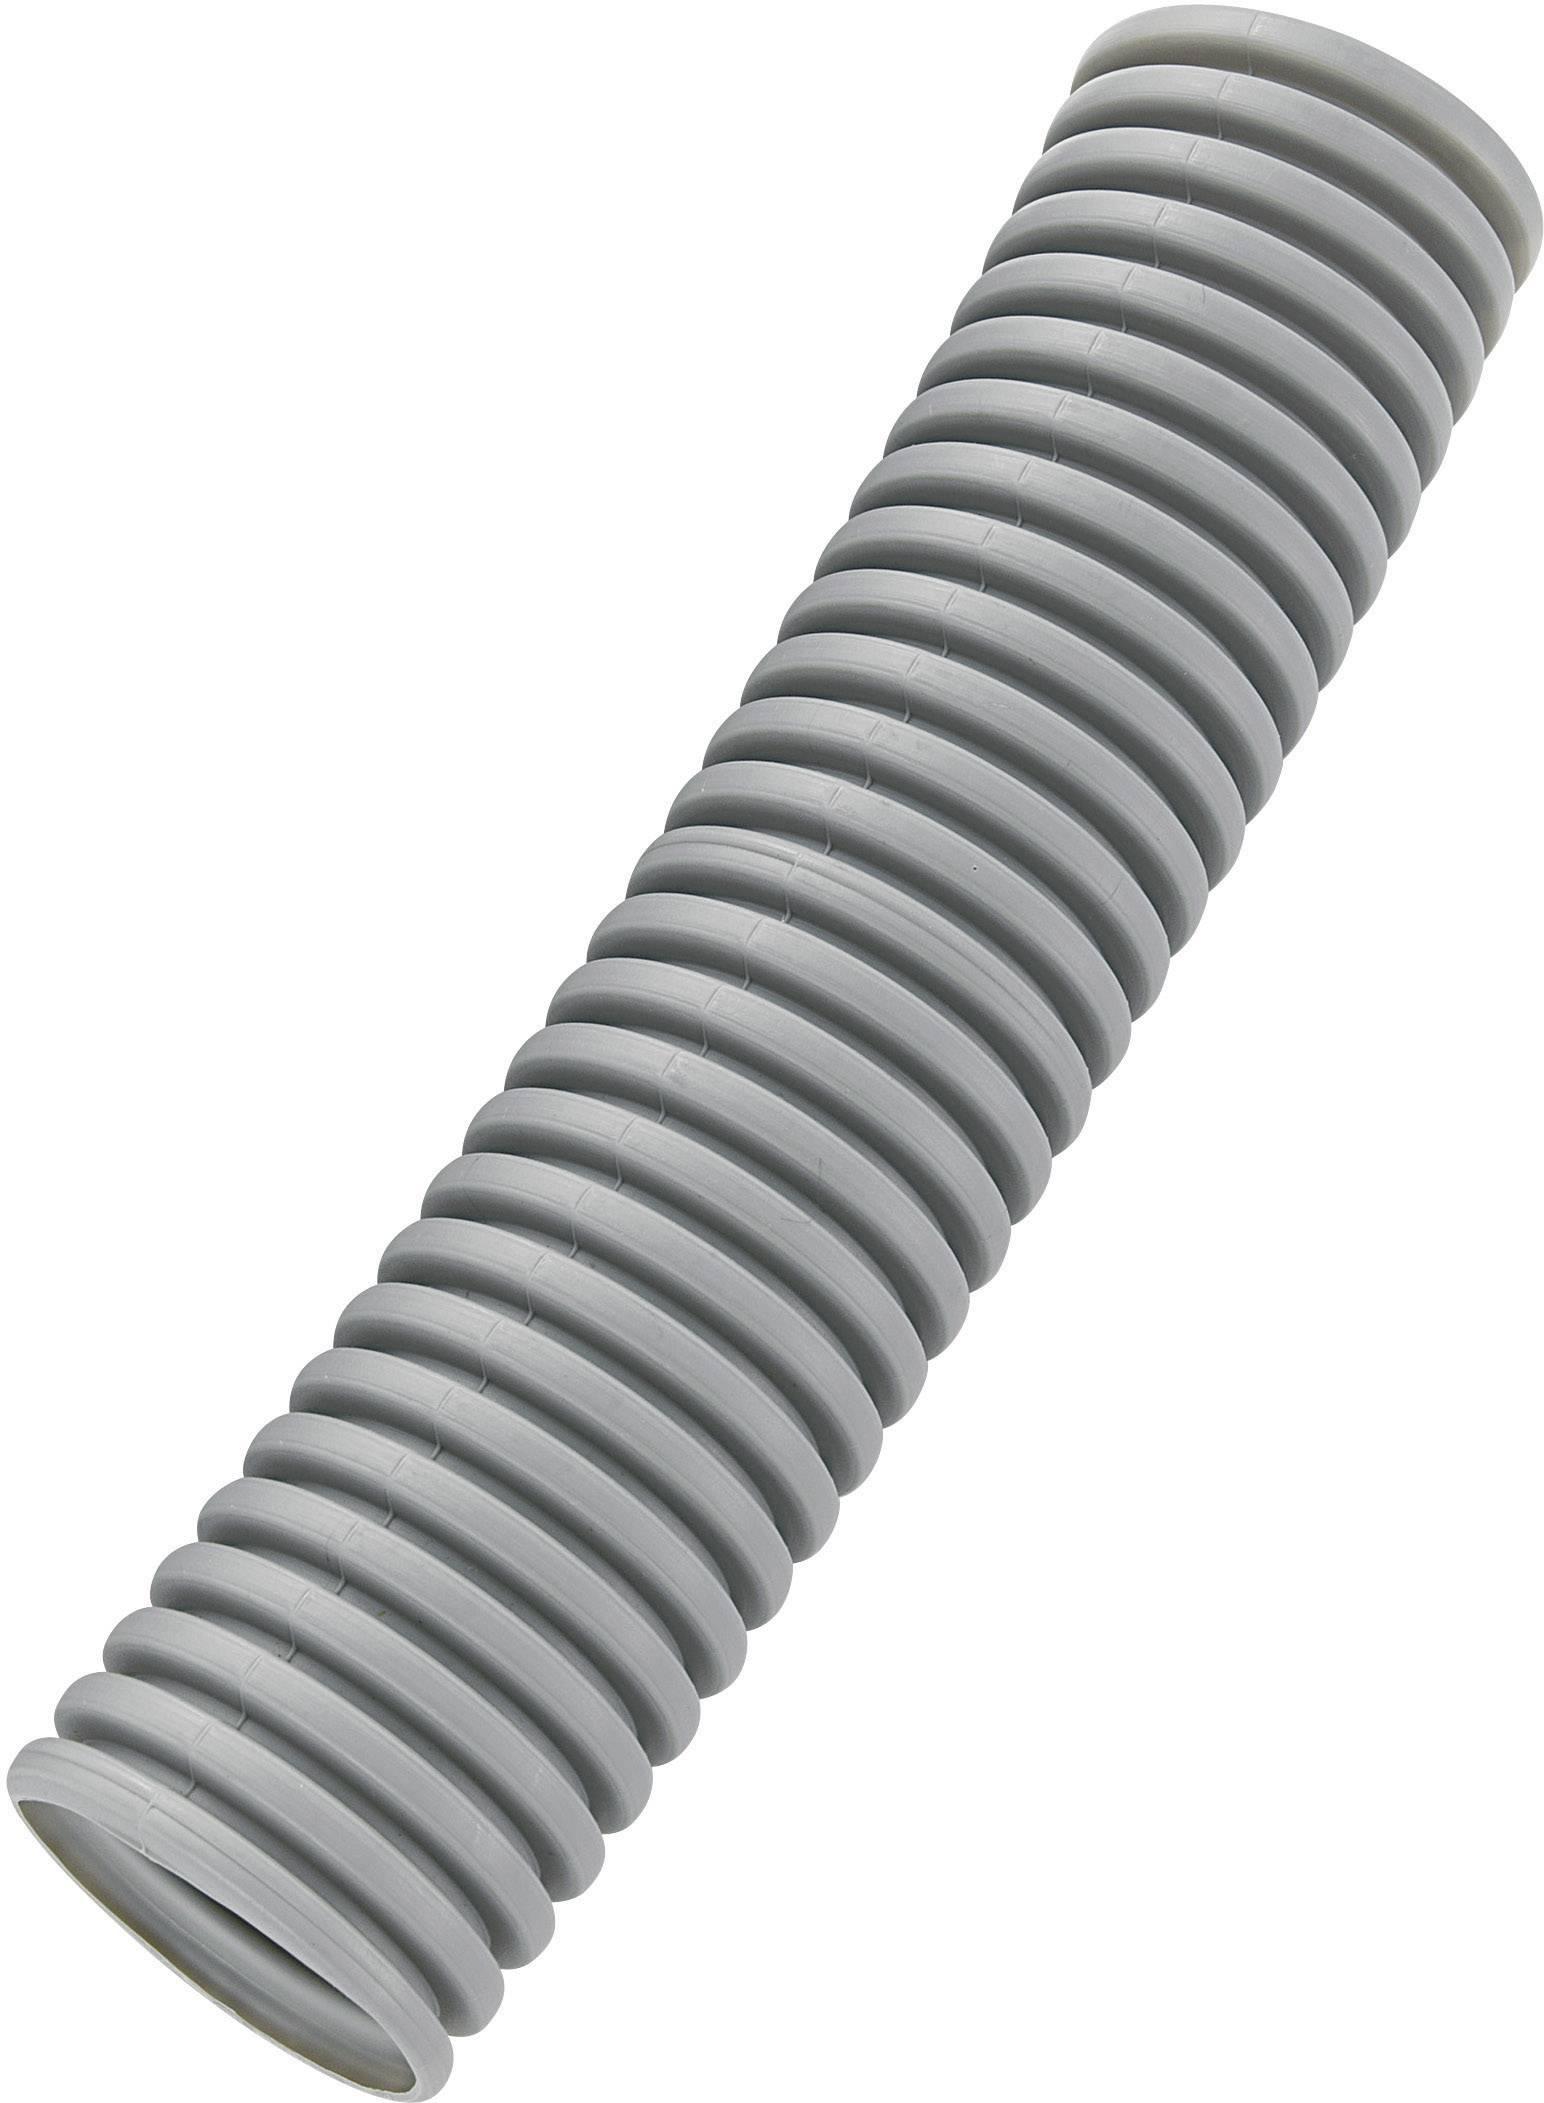 Husí krk KSS BGR40P, 40 mm, šedá